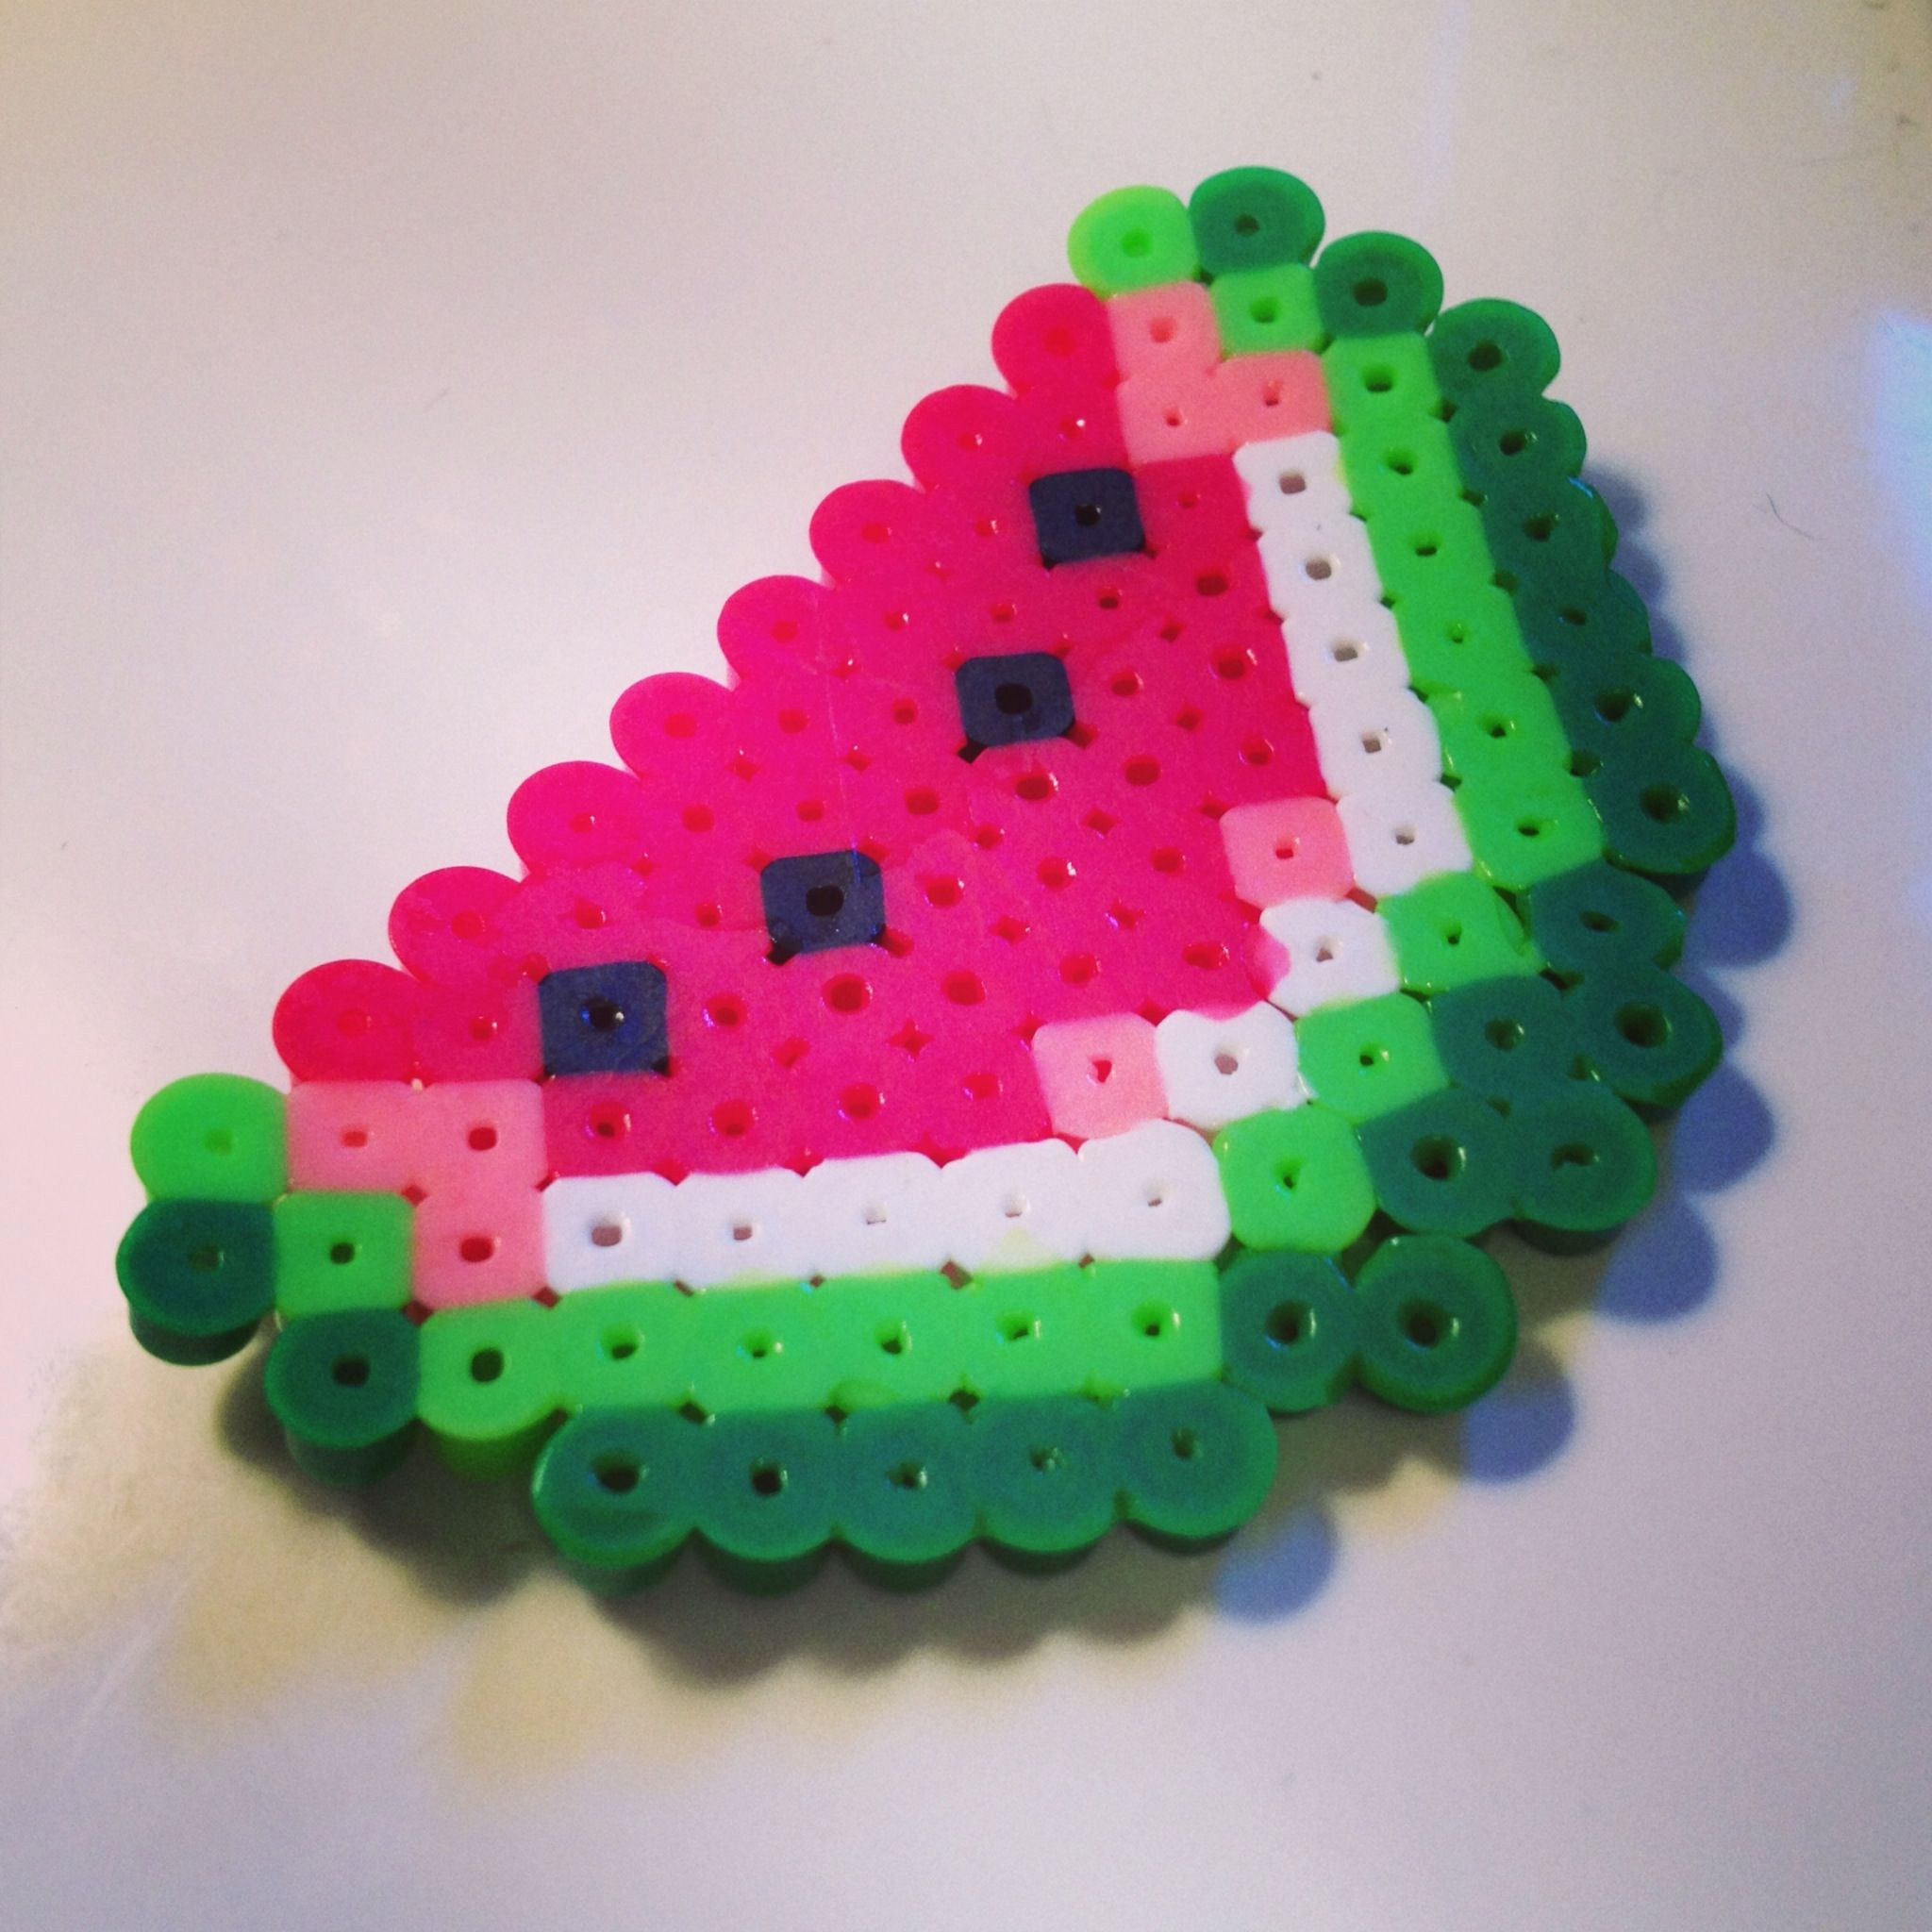 Minecraft Pixel Art Melon Year Of Clean Water